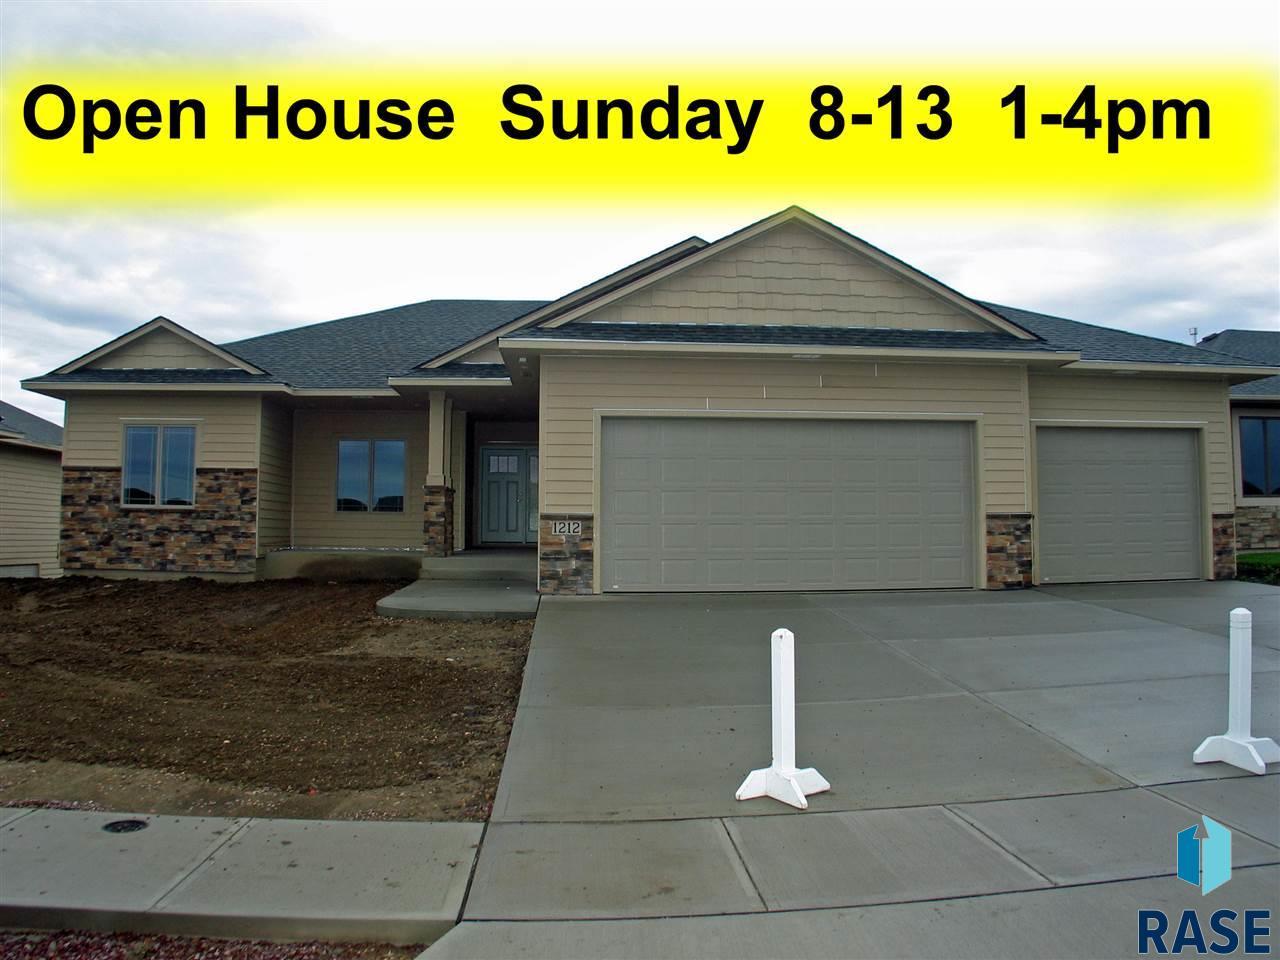 1212 South Wheatland Ave, Sioux Falls, SD 57106